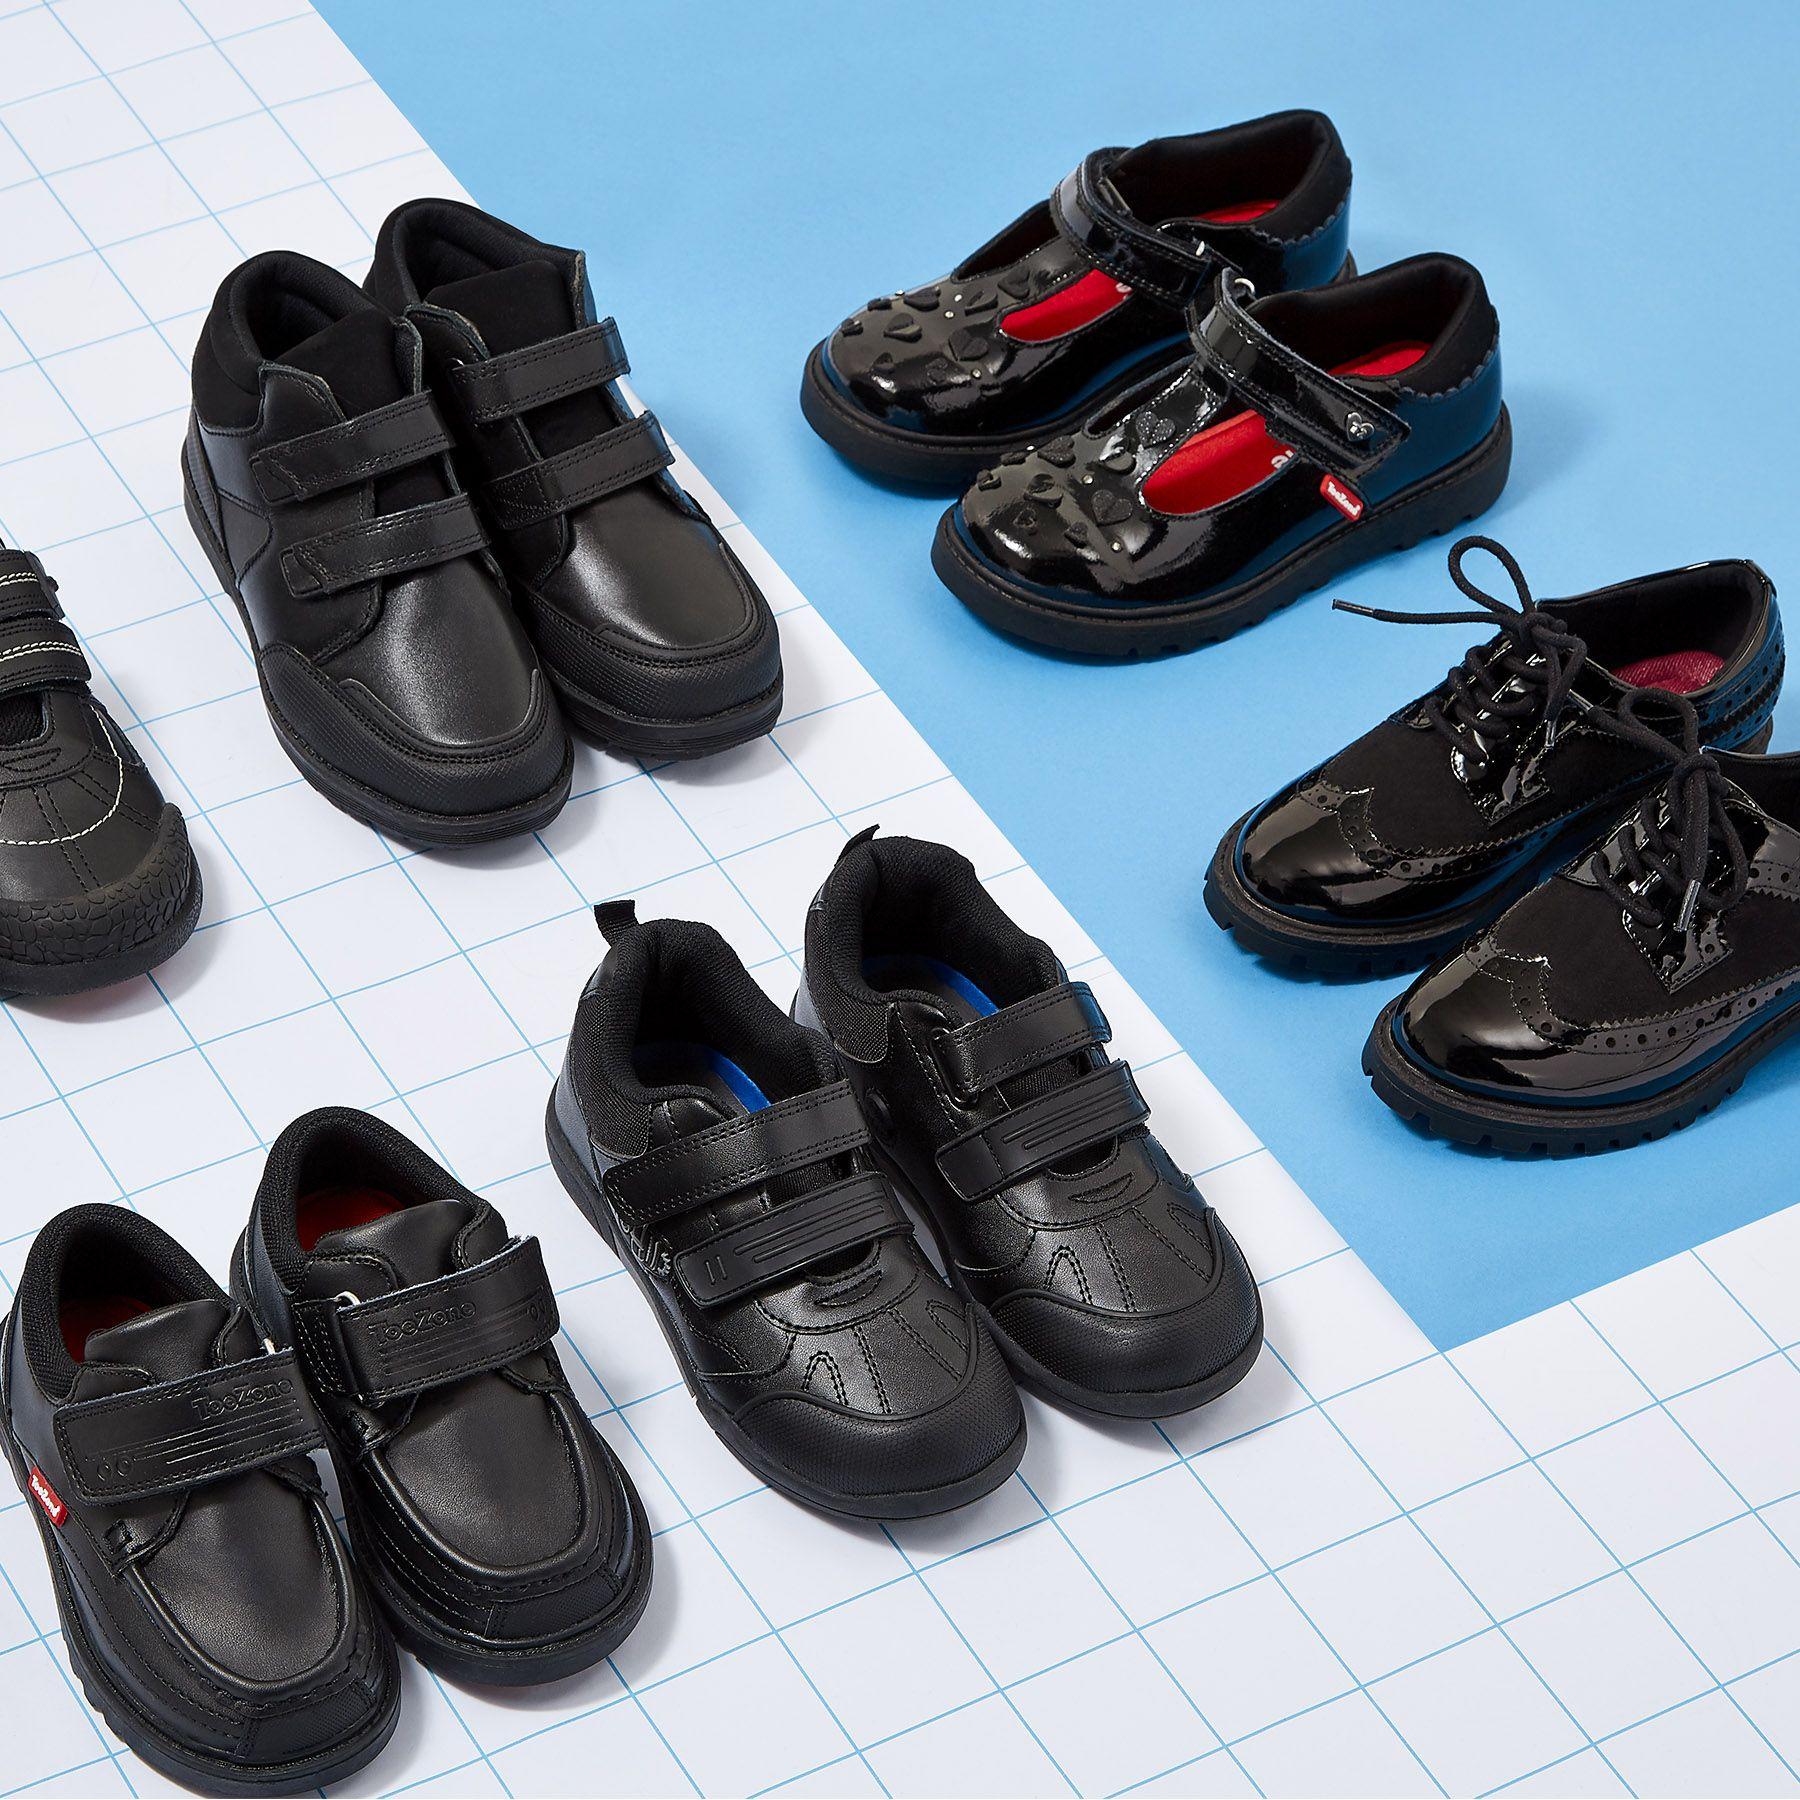 No scuffs here | School shoes, School